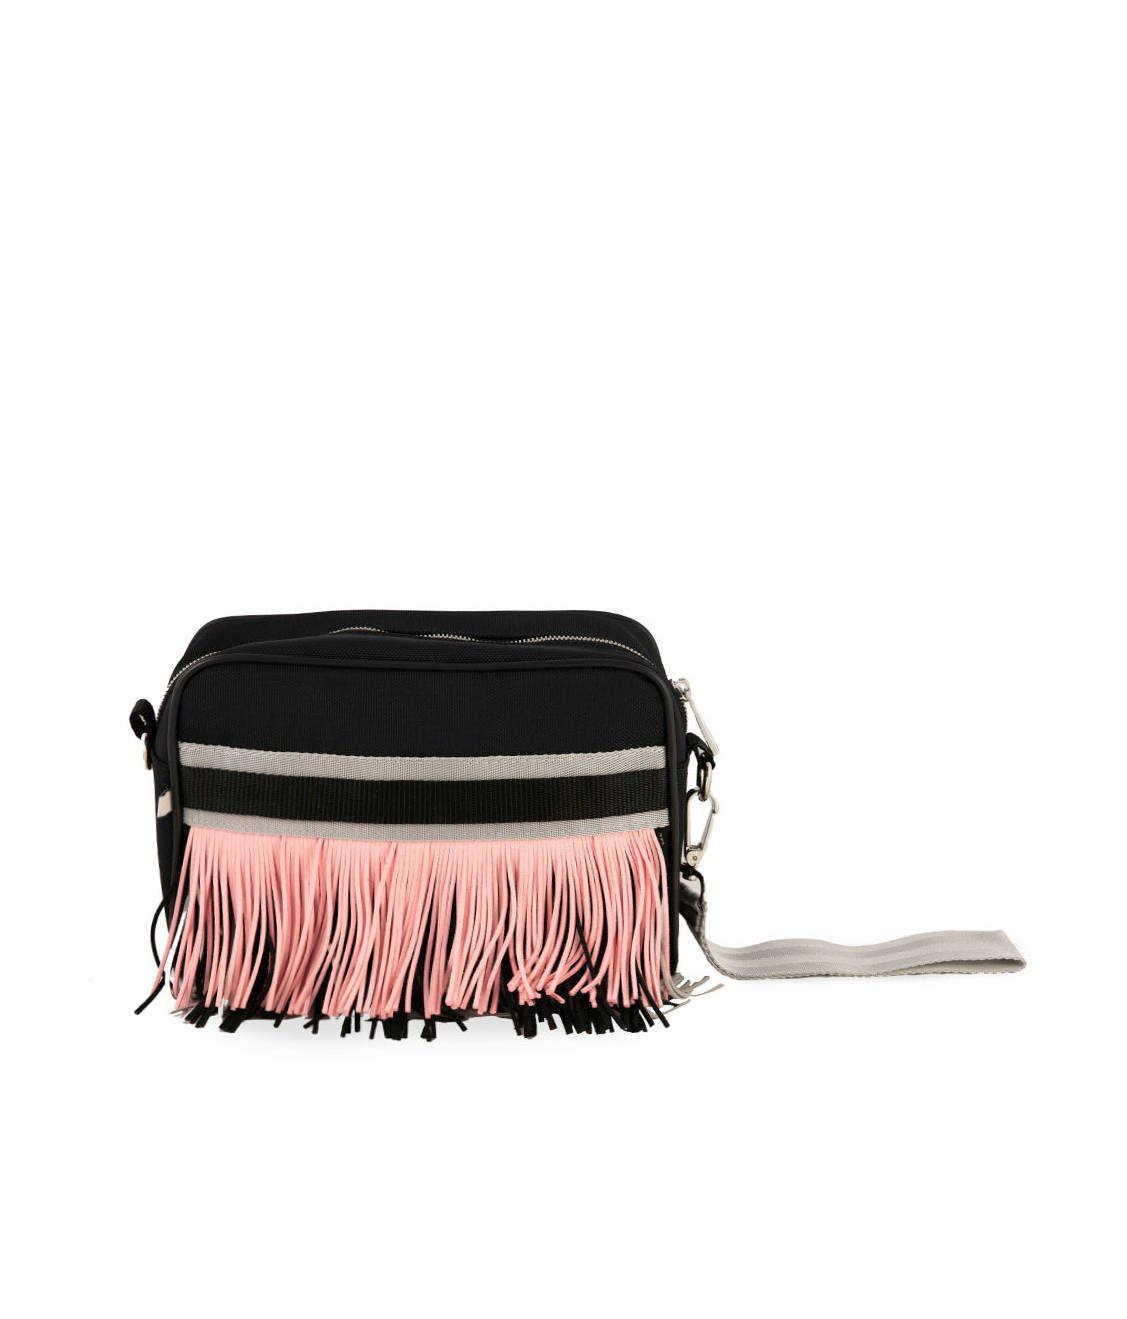 Beauty Bag in Tessuto Tecnico Nero Frange  in Alcantara Rosa Grigio Nere Quittobags